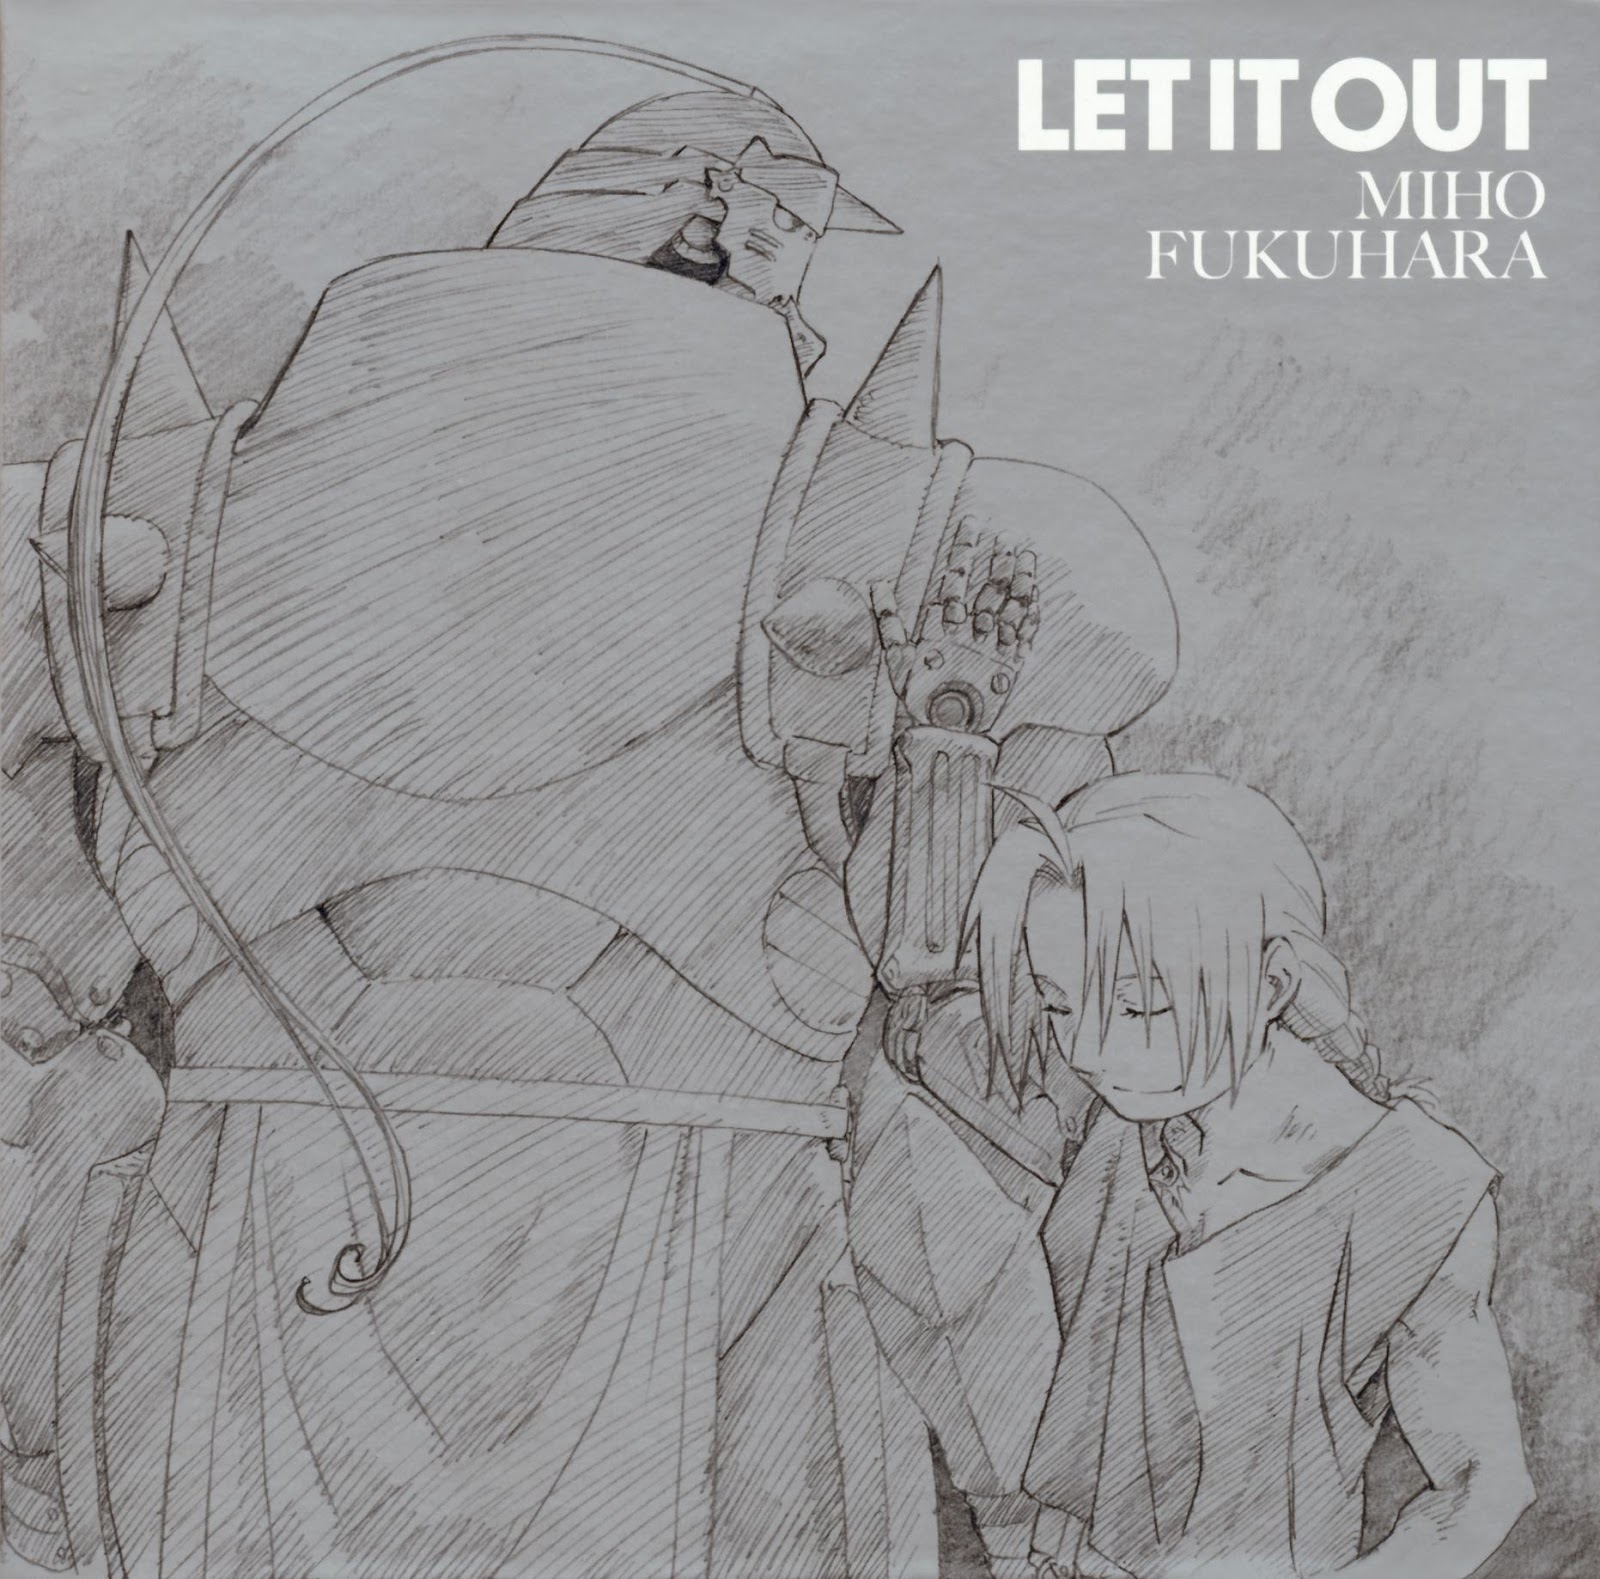 Miho Fukuhara - LET IT OUT   Fullmetal Alchemist: Brotherhood Ending 2 Theme Song